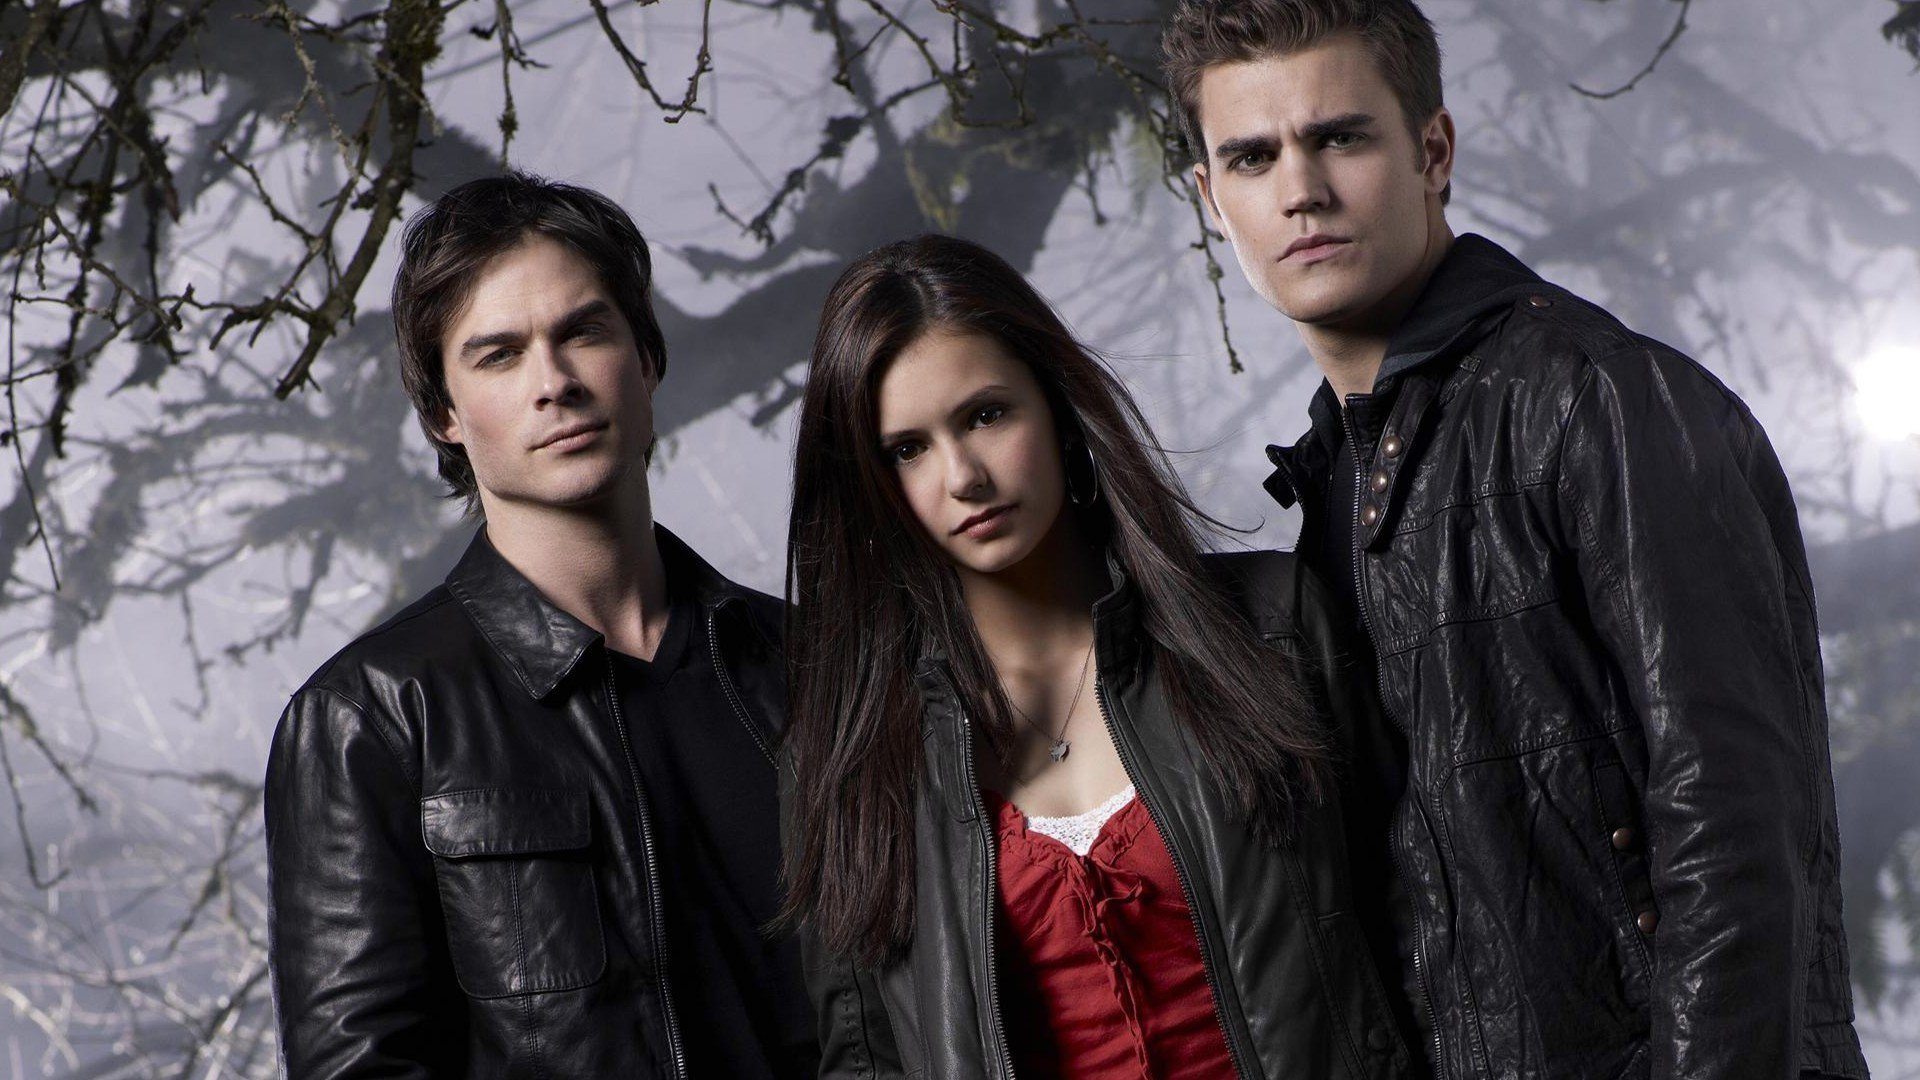 Vampire Diaires